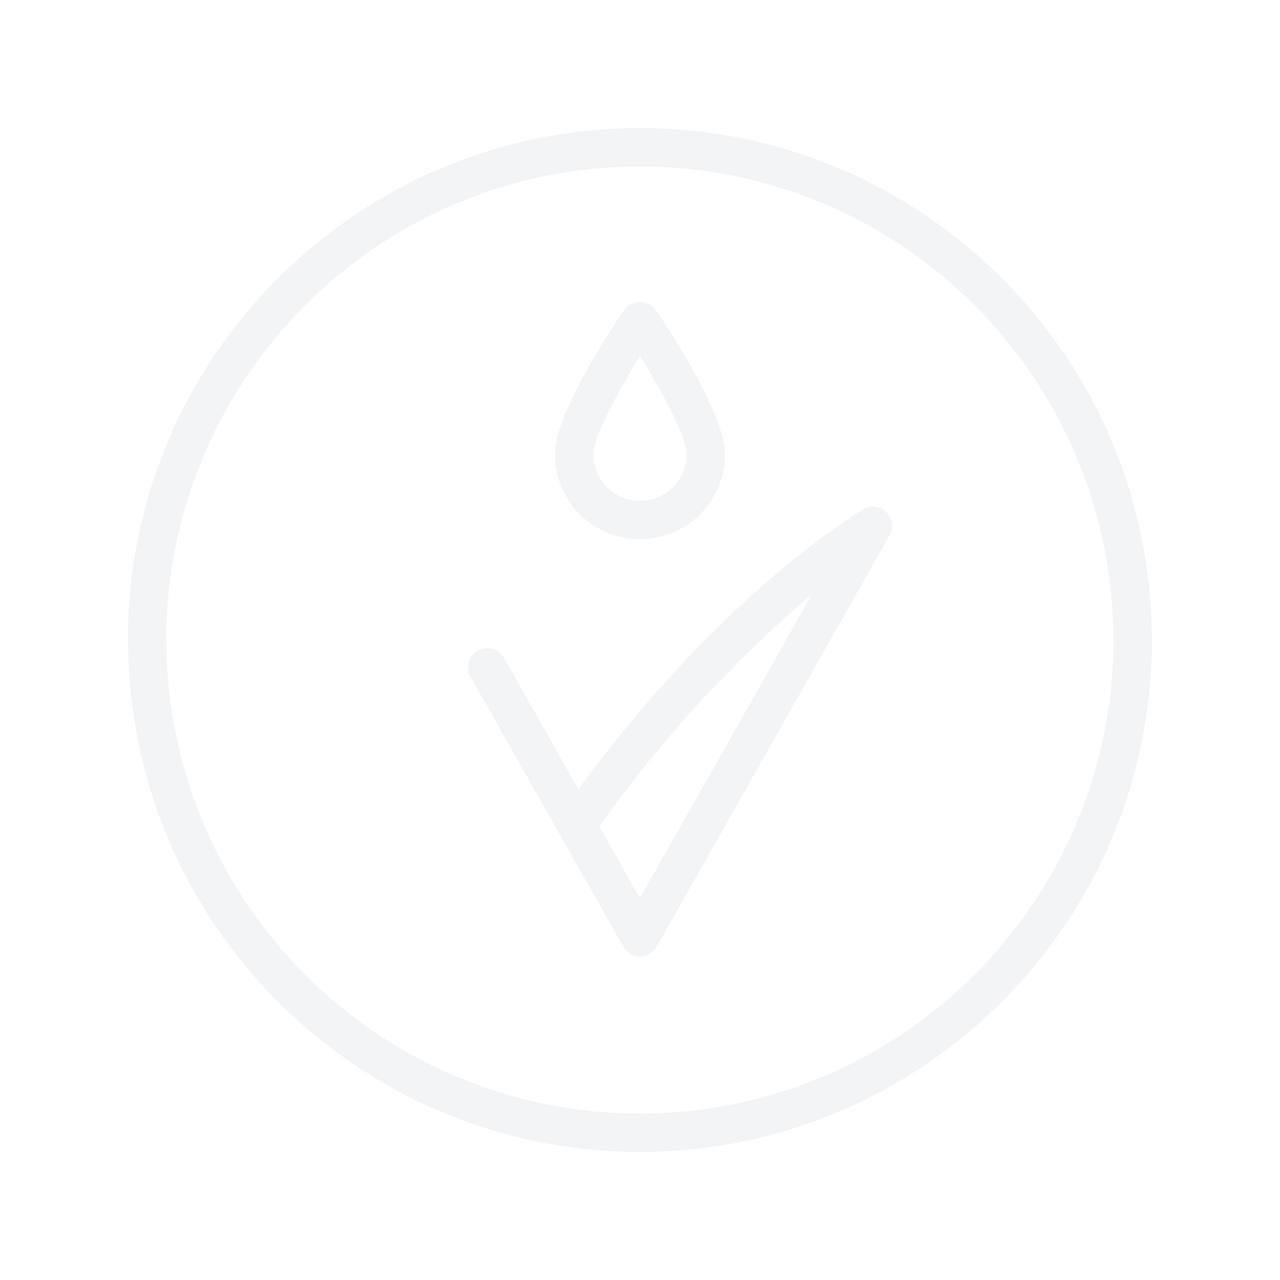 MAYBELLINE Tattoo Brow Tint Micro-Pen 1.1ml